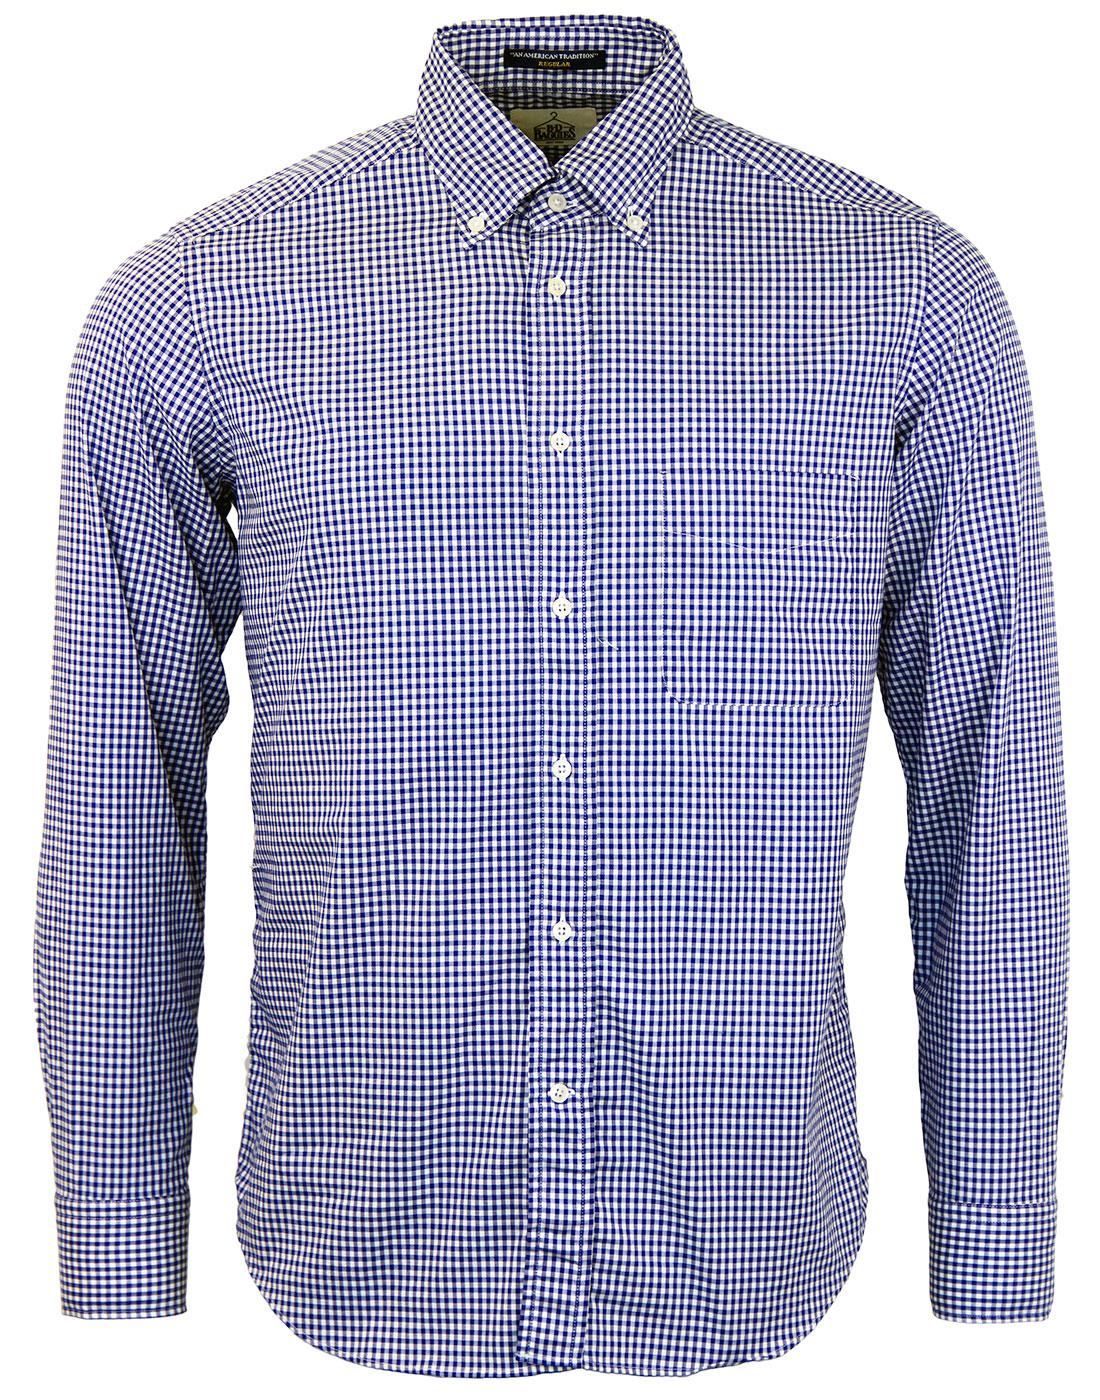 Bradford B D BAGGIES L/S Classic Mod Gingham Shirt